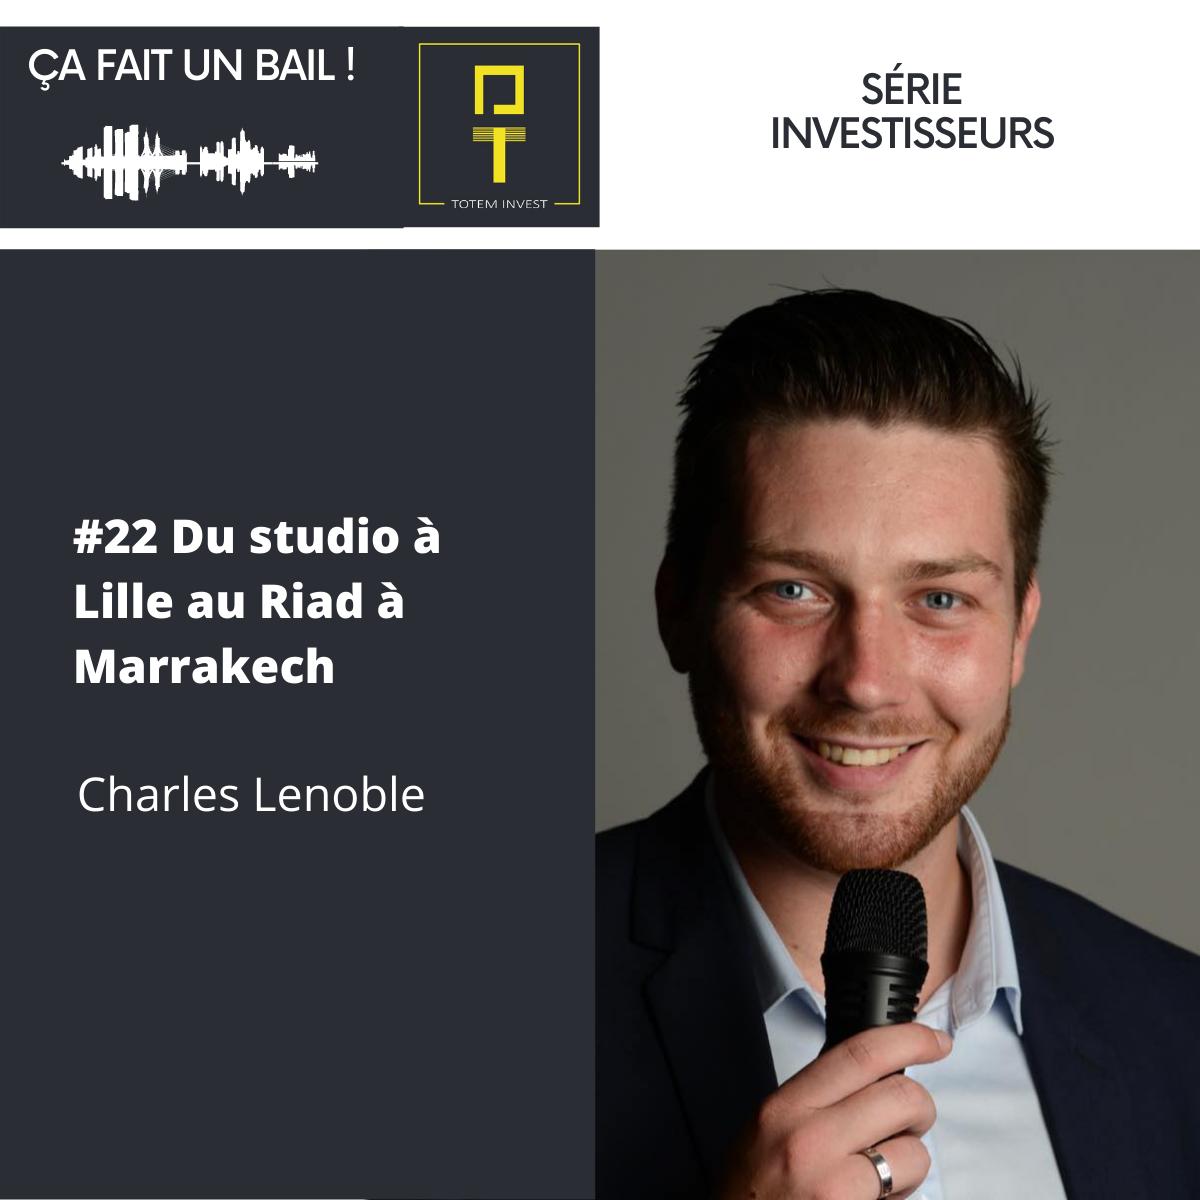 Charles Lenoble ÇA FAIT UN BAIL